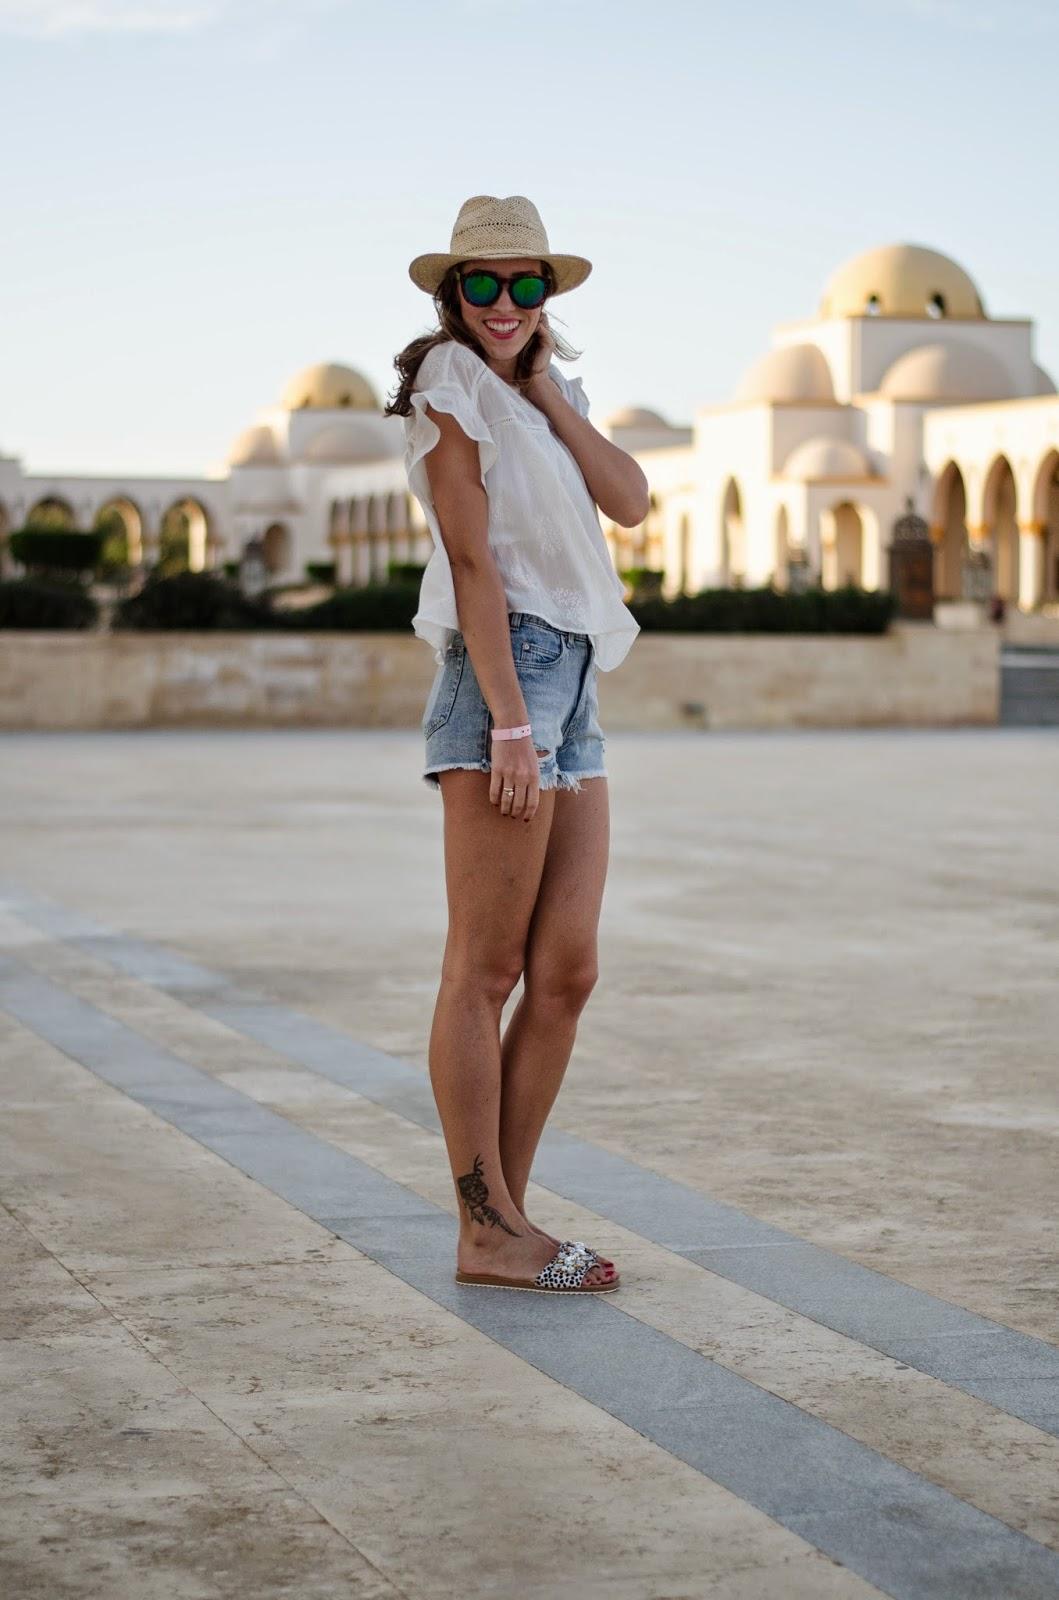 kristjaana mere sahl hasheesh blue jeans white shirt summer 2015 trend